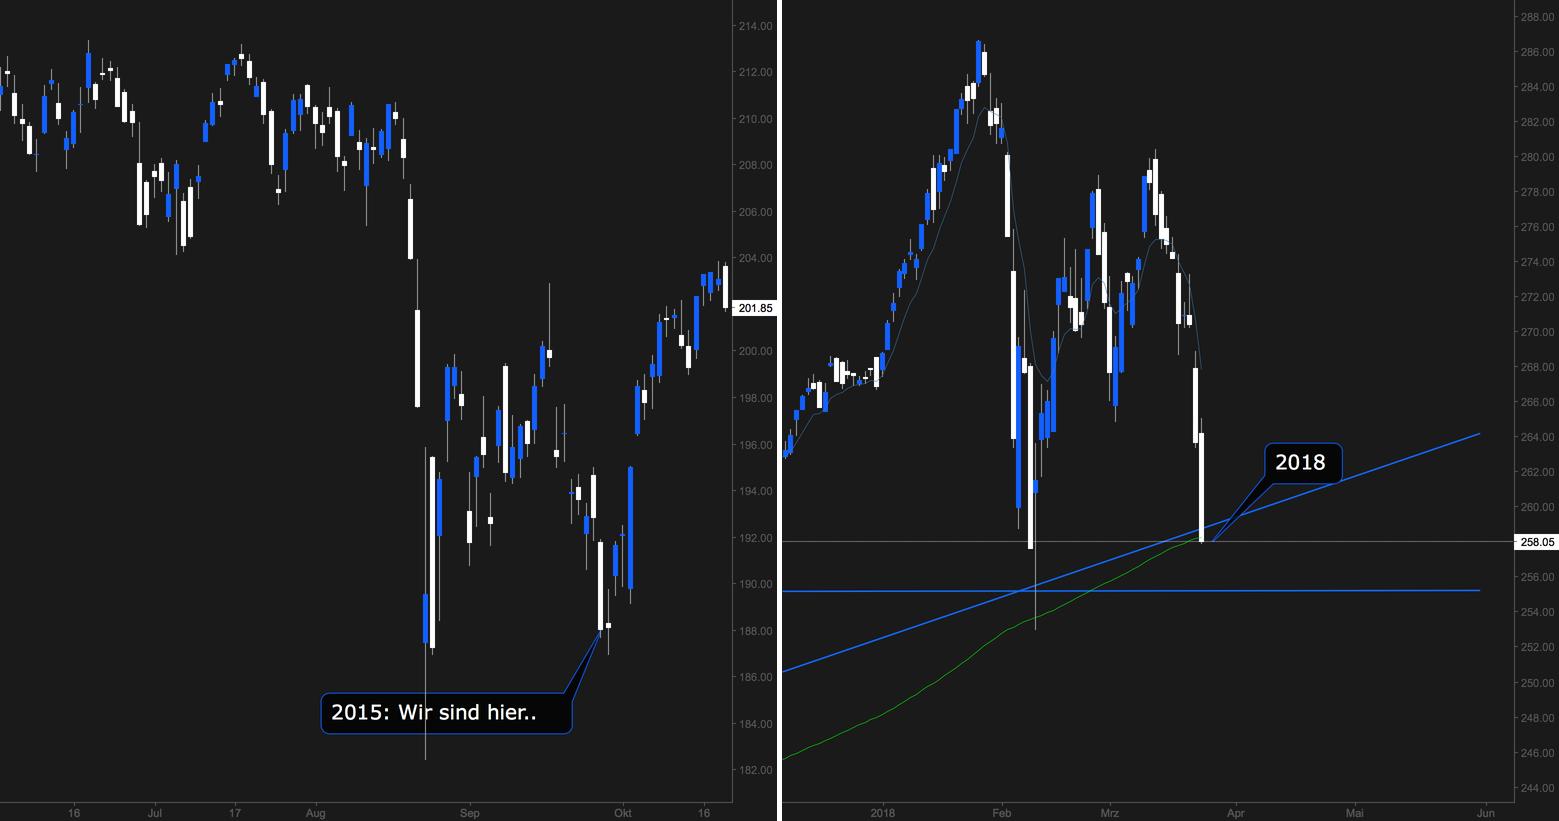 S&P 500: 2015 vs. 2018 - Absturz? Nein, long...